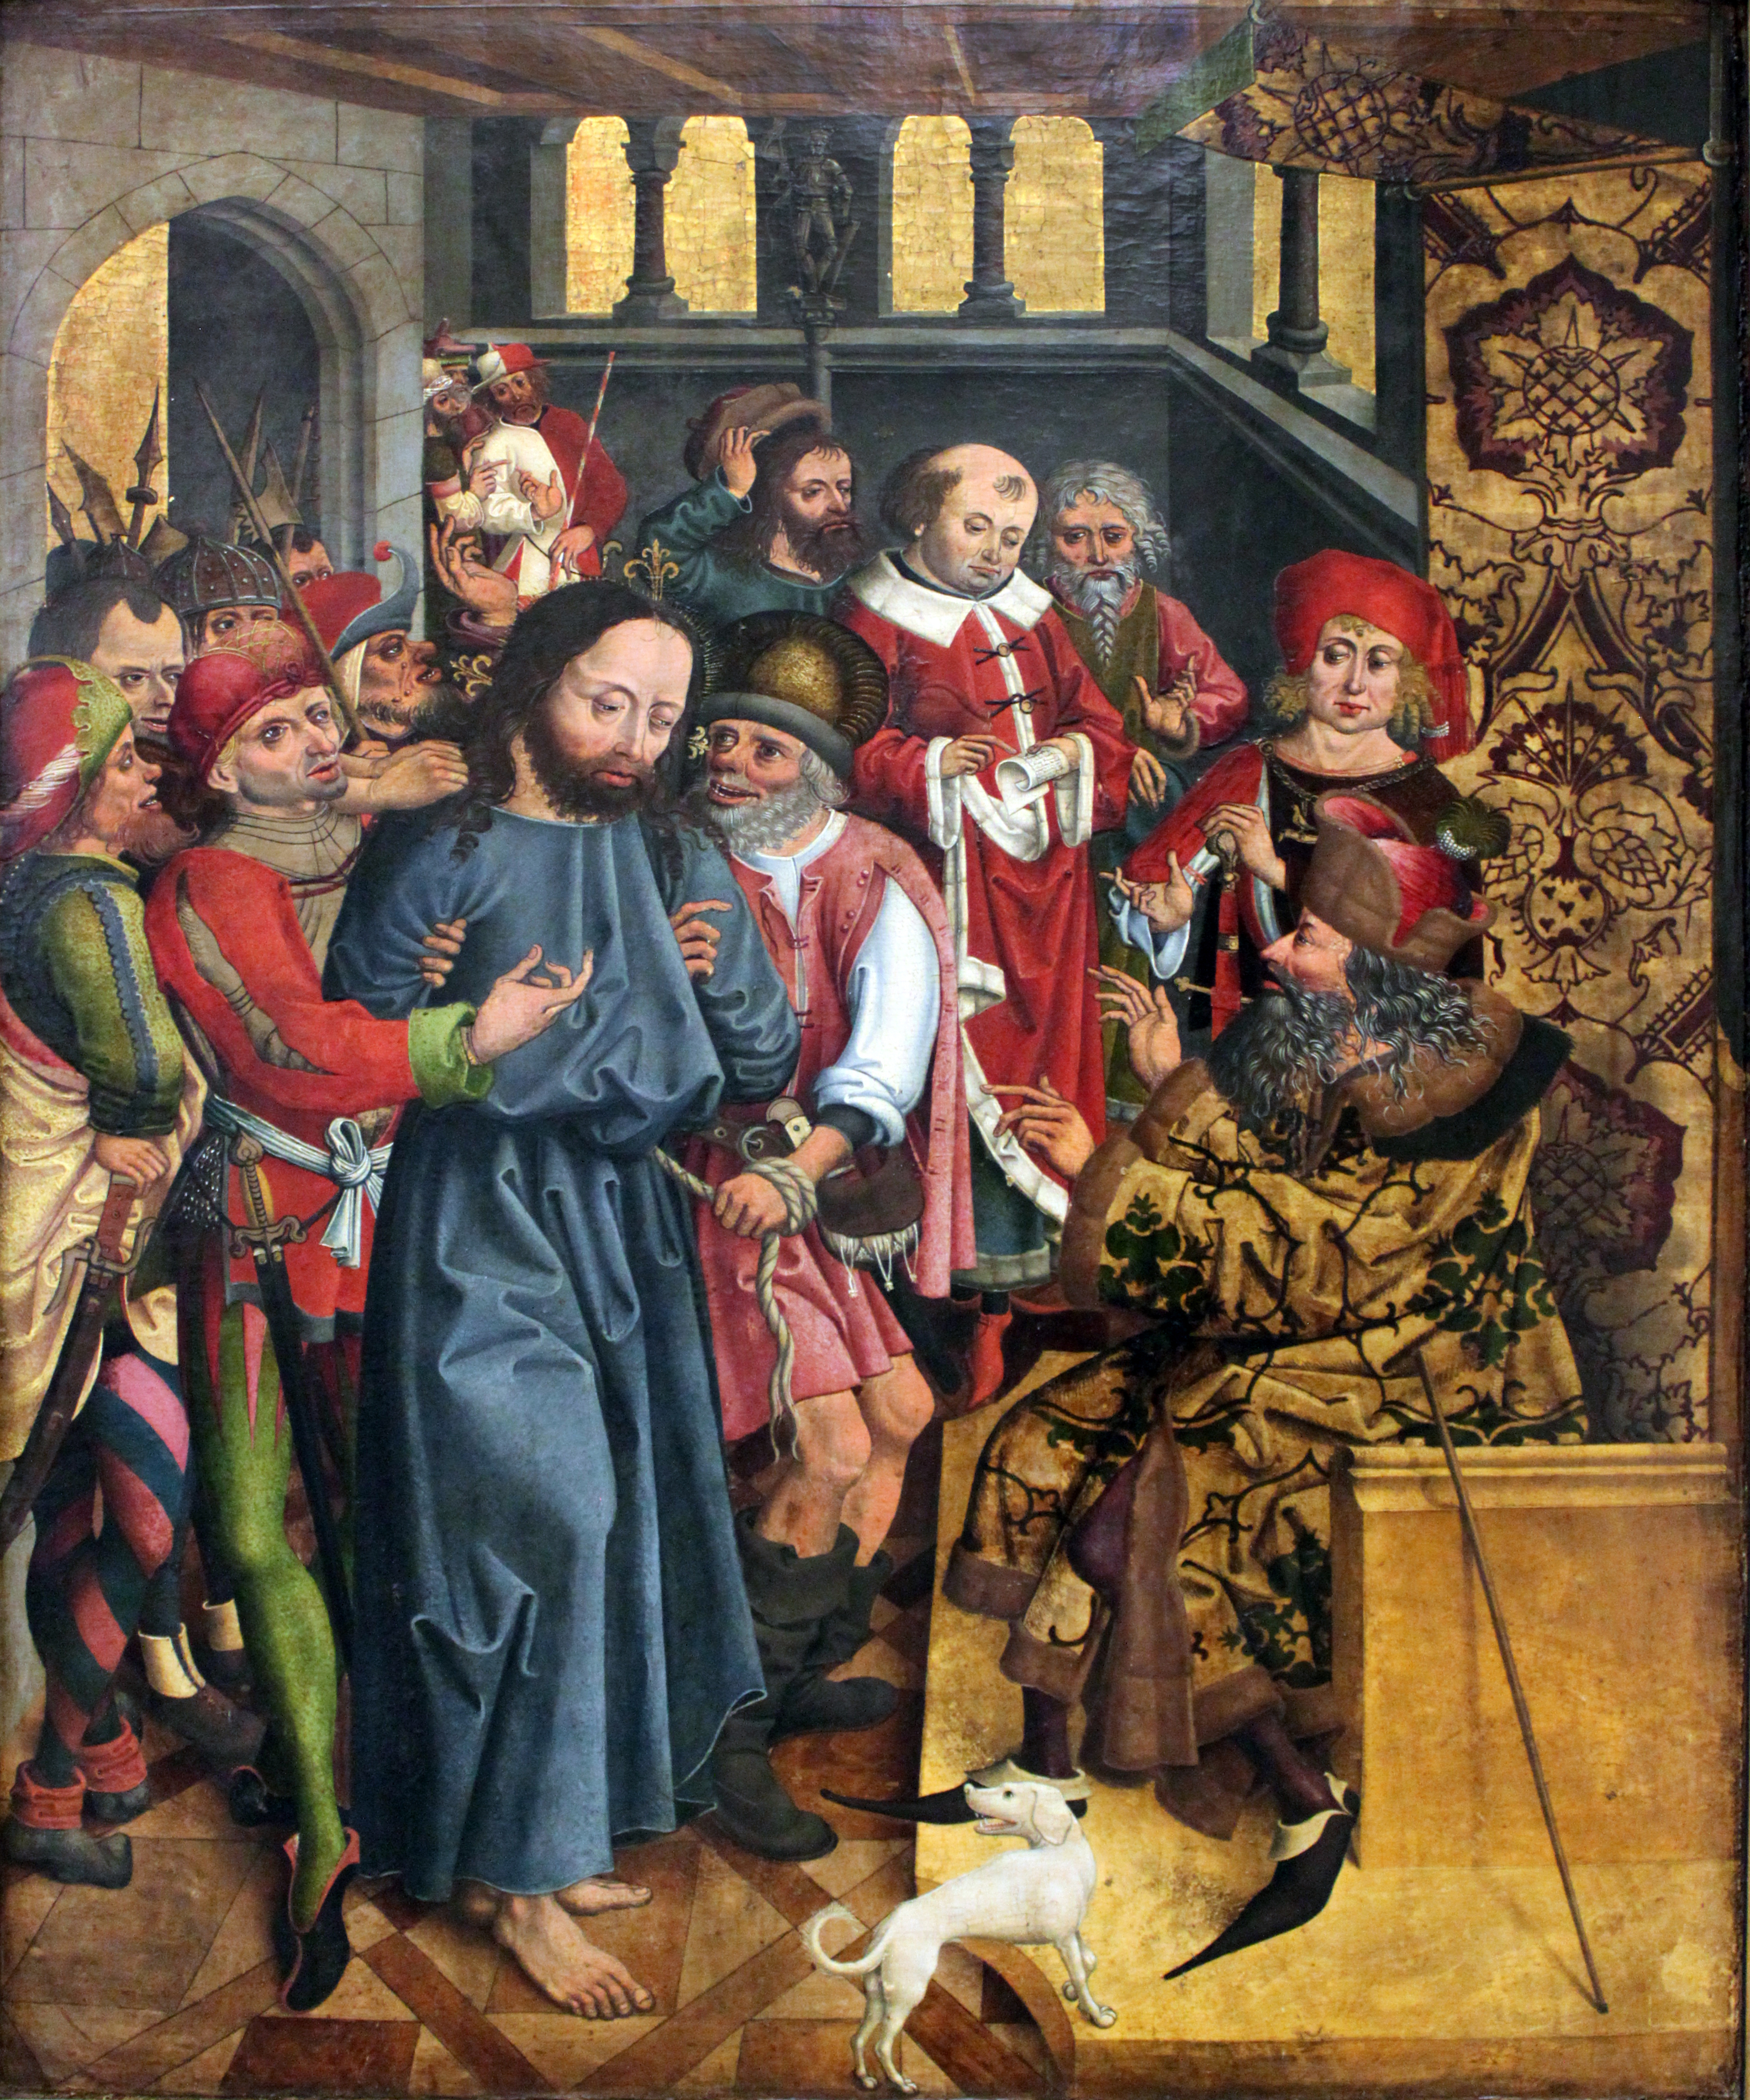 1483_Katzheimer_Christus_vor_Kaiphas_anagoria